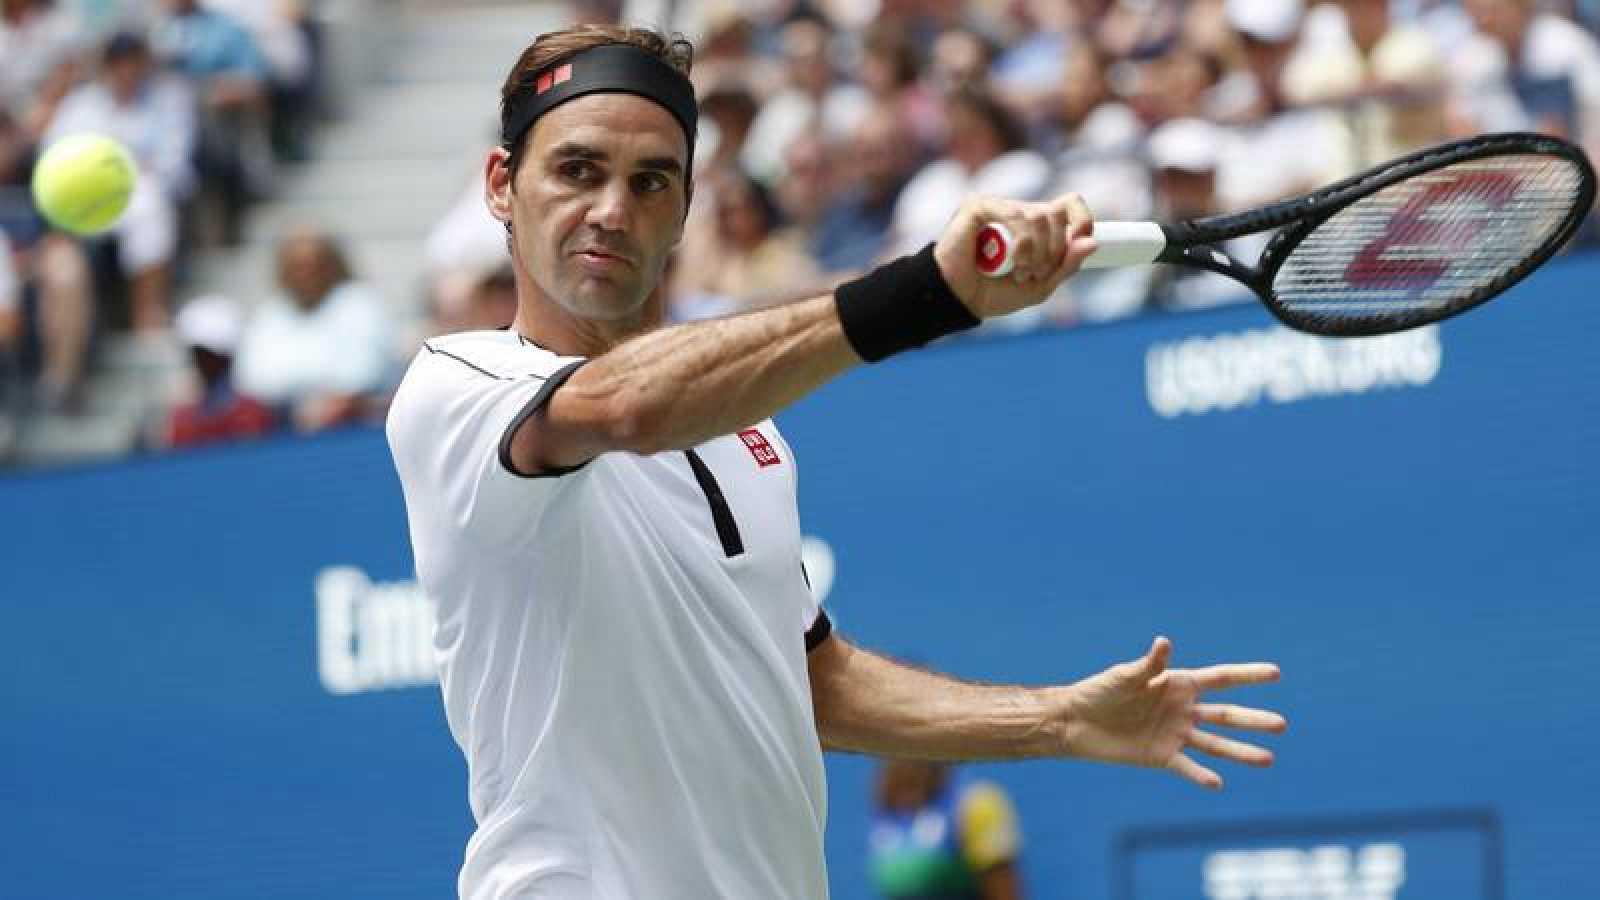 Federer arrolla a Goffin para llegar a cuartos del US Open